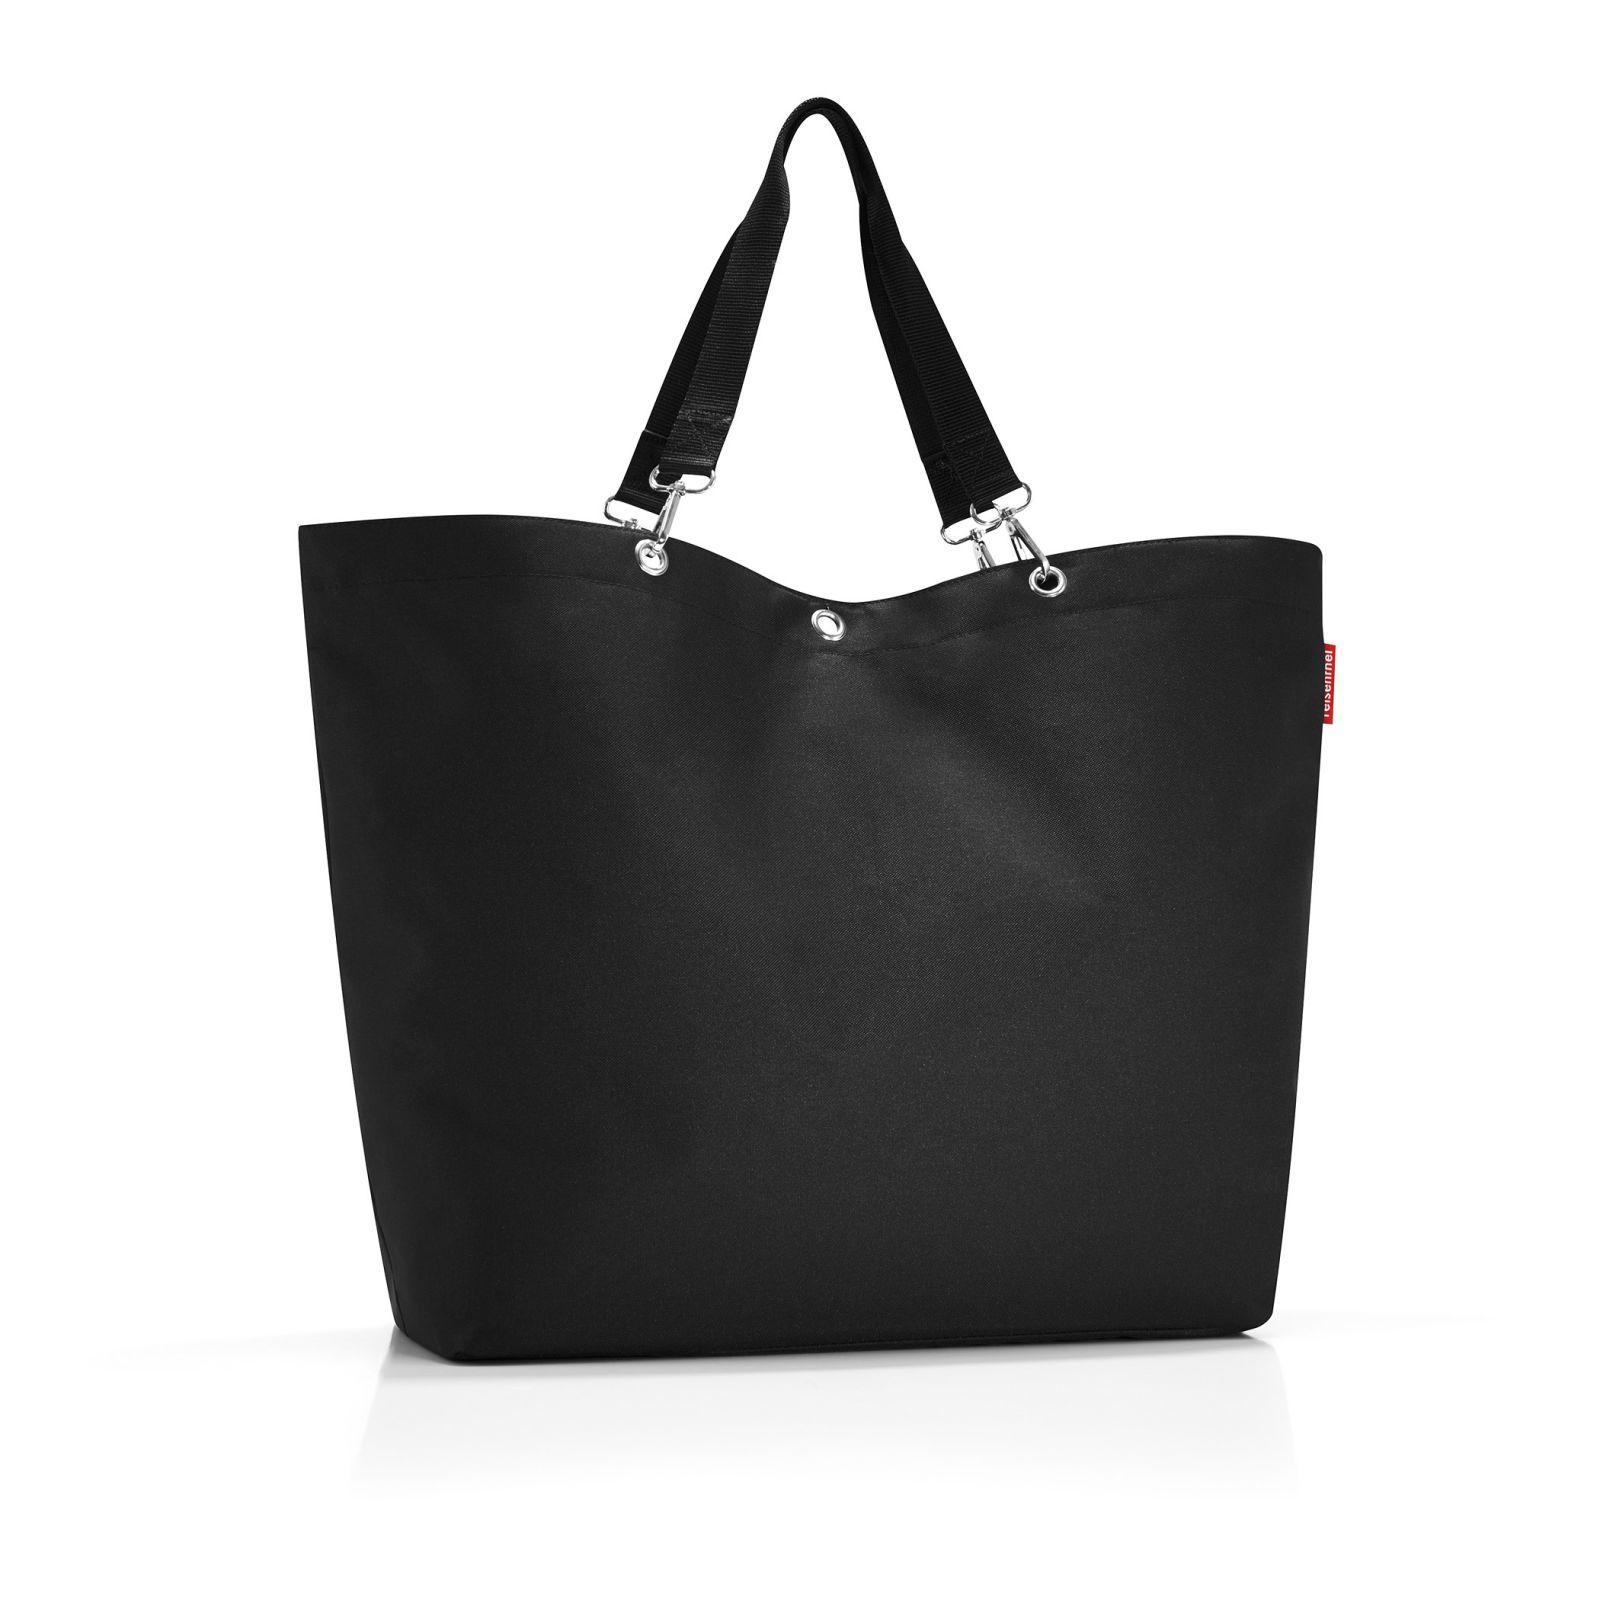 Reisenthel Shopper XL Black E-batoh